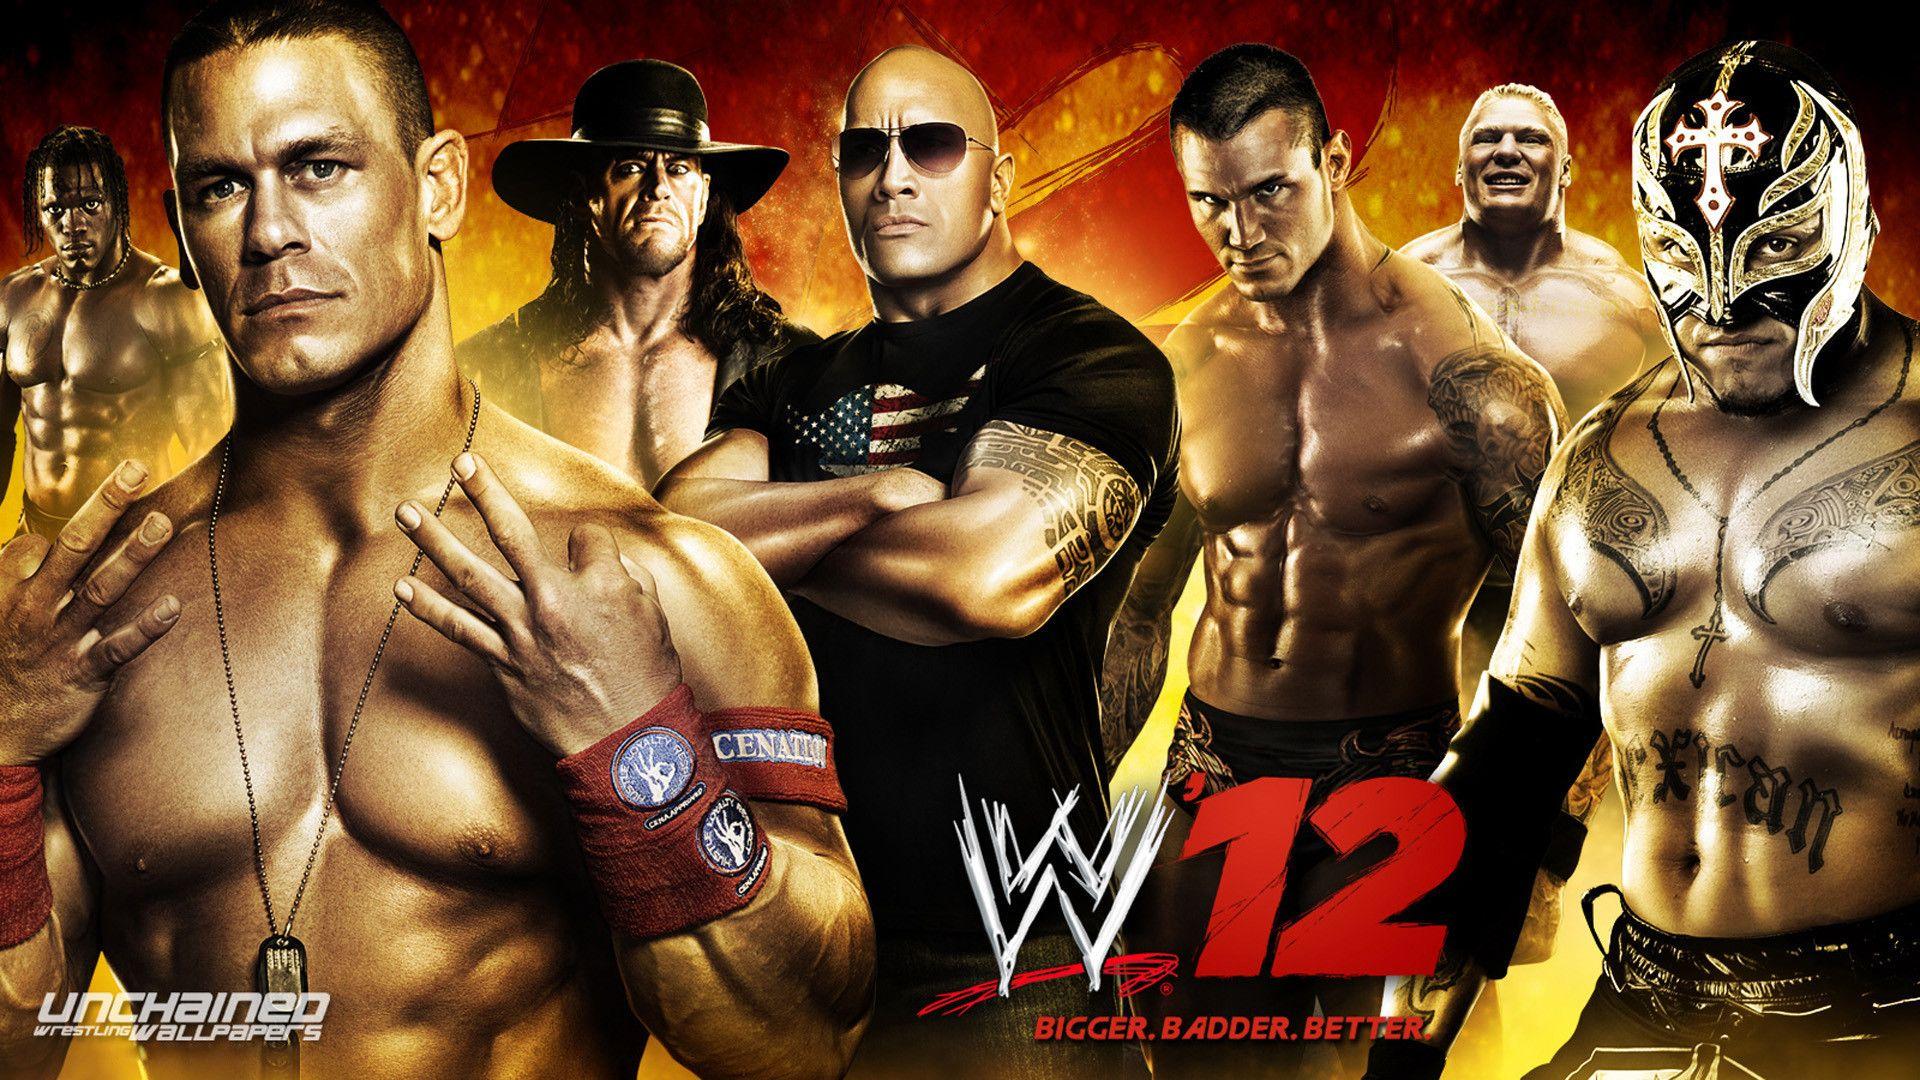 Hd Wwe Wrestlers Hd Wallpapers Download Wwe Wallpapers John Cena Wwe Pictures